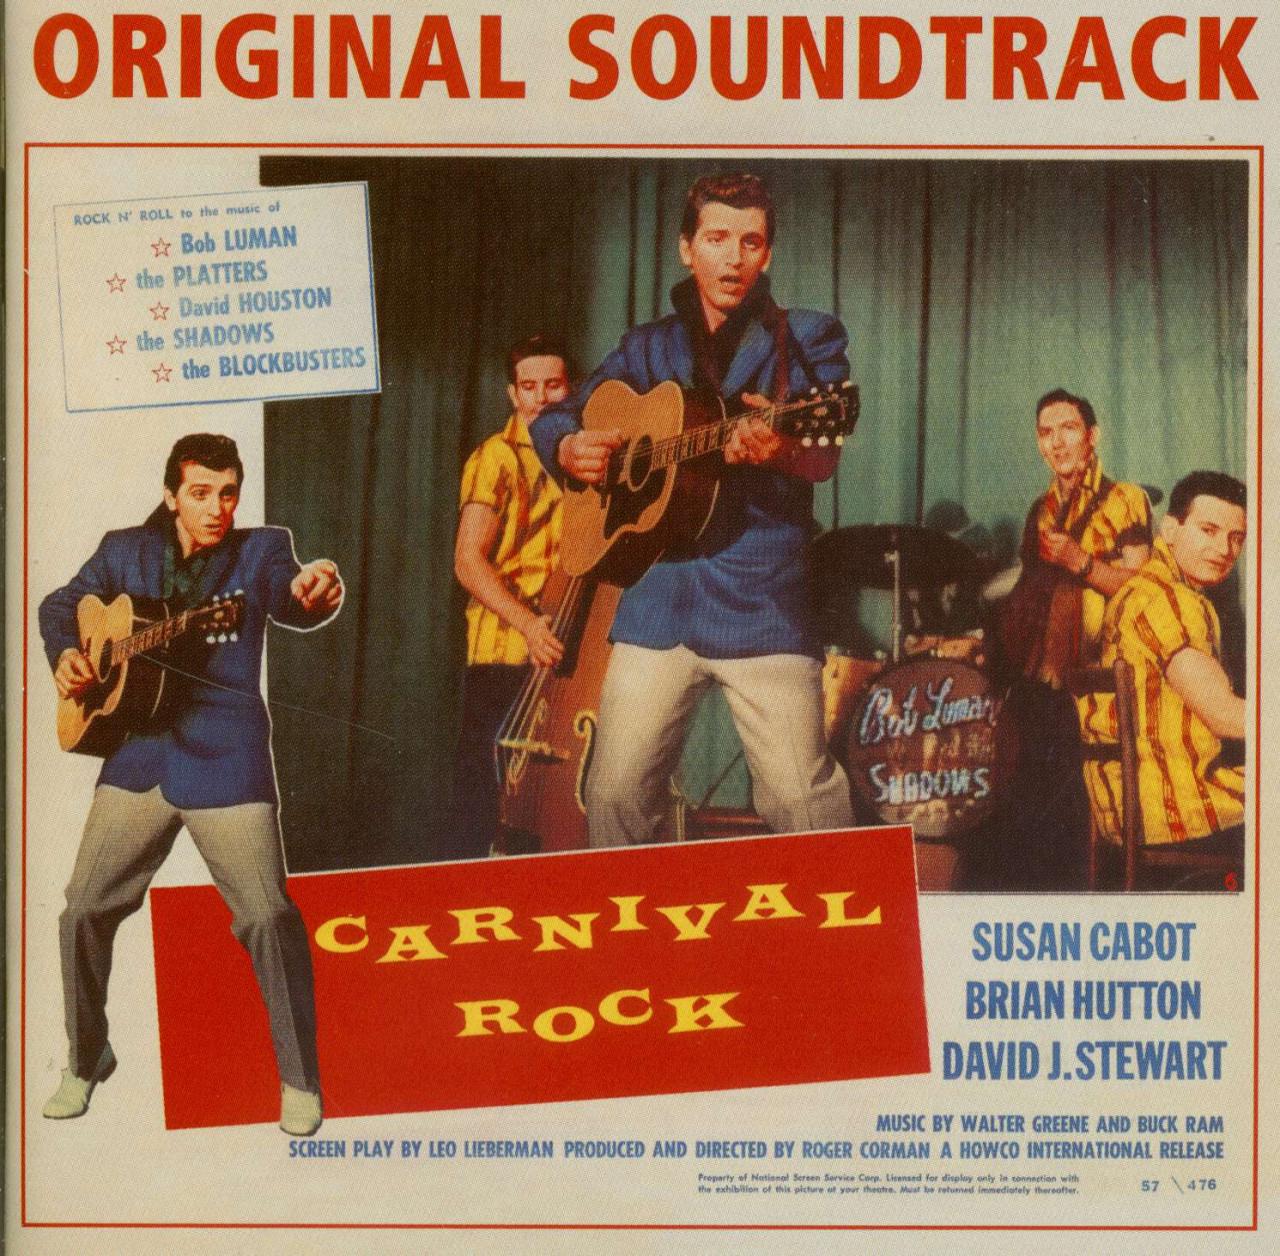 Bob Luman & Others CD: Carnival Rock - Original 1957 Soundtrack ...